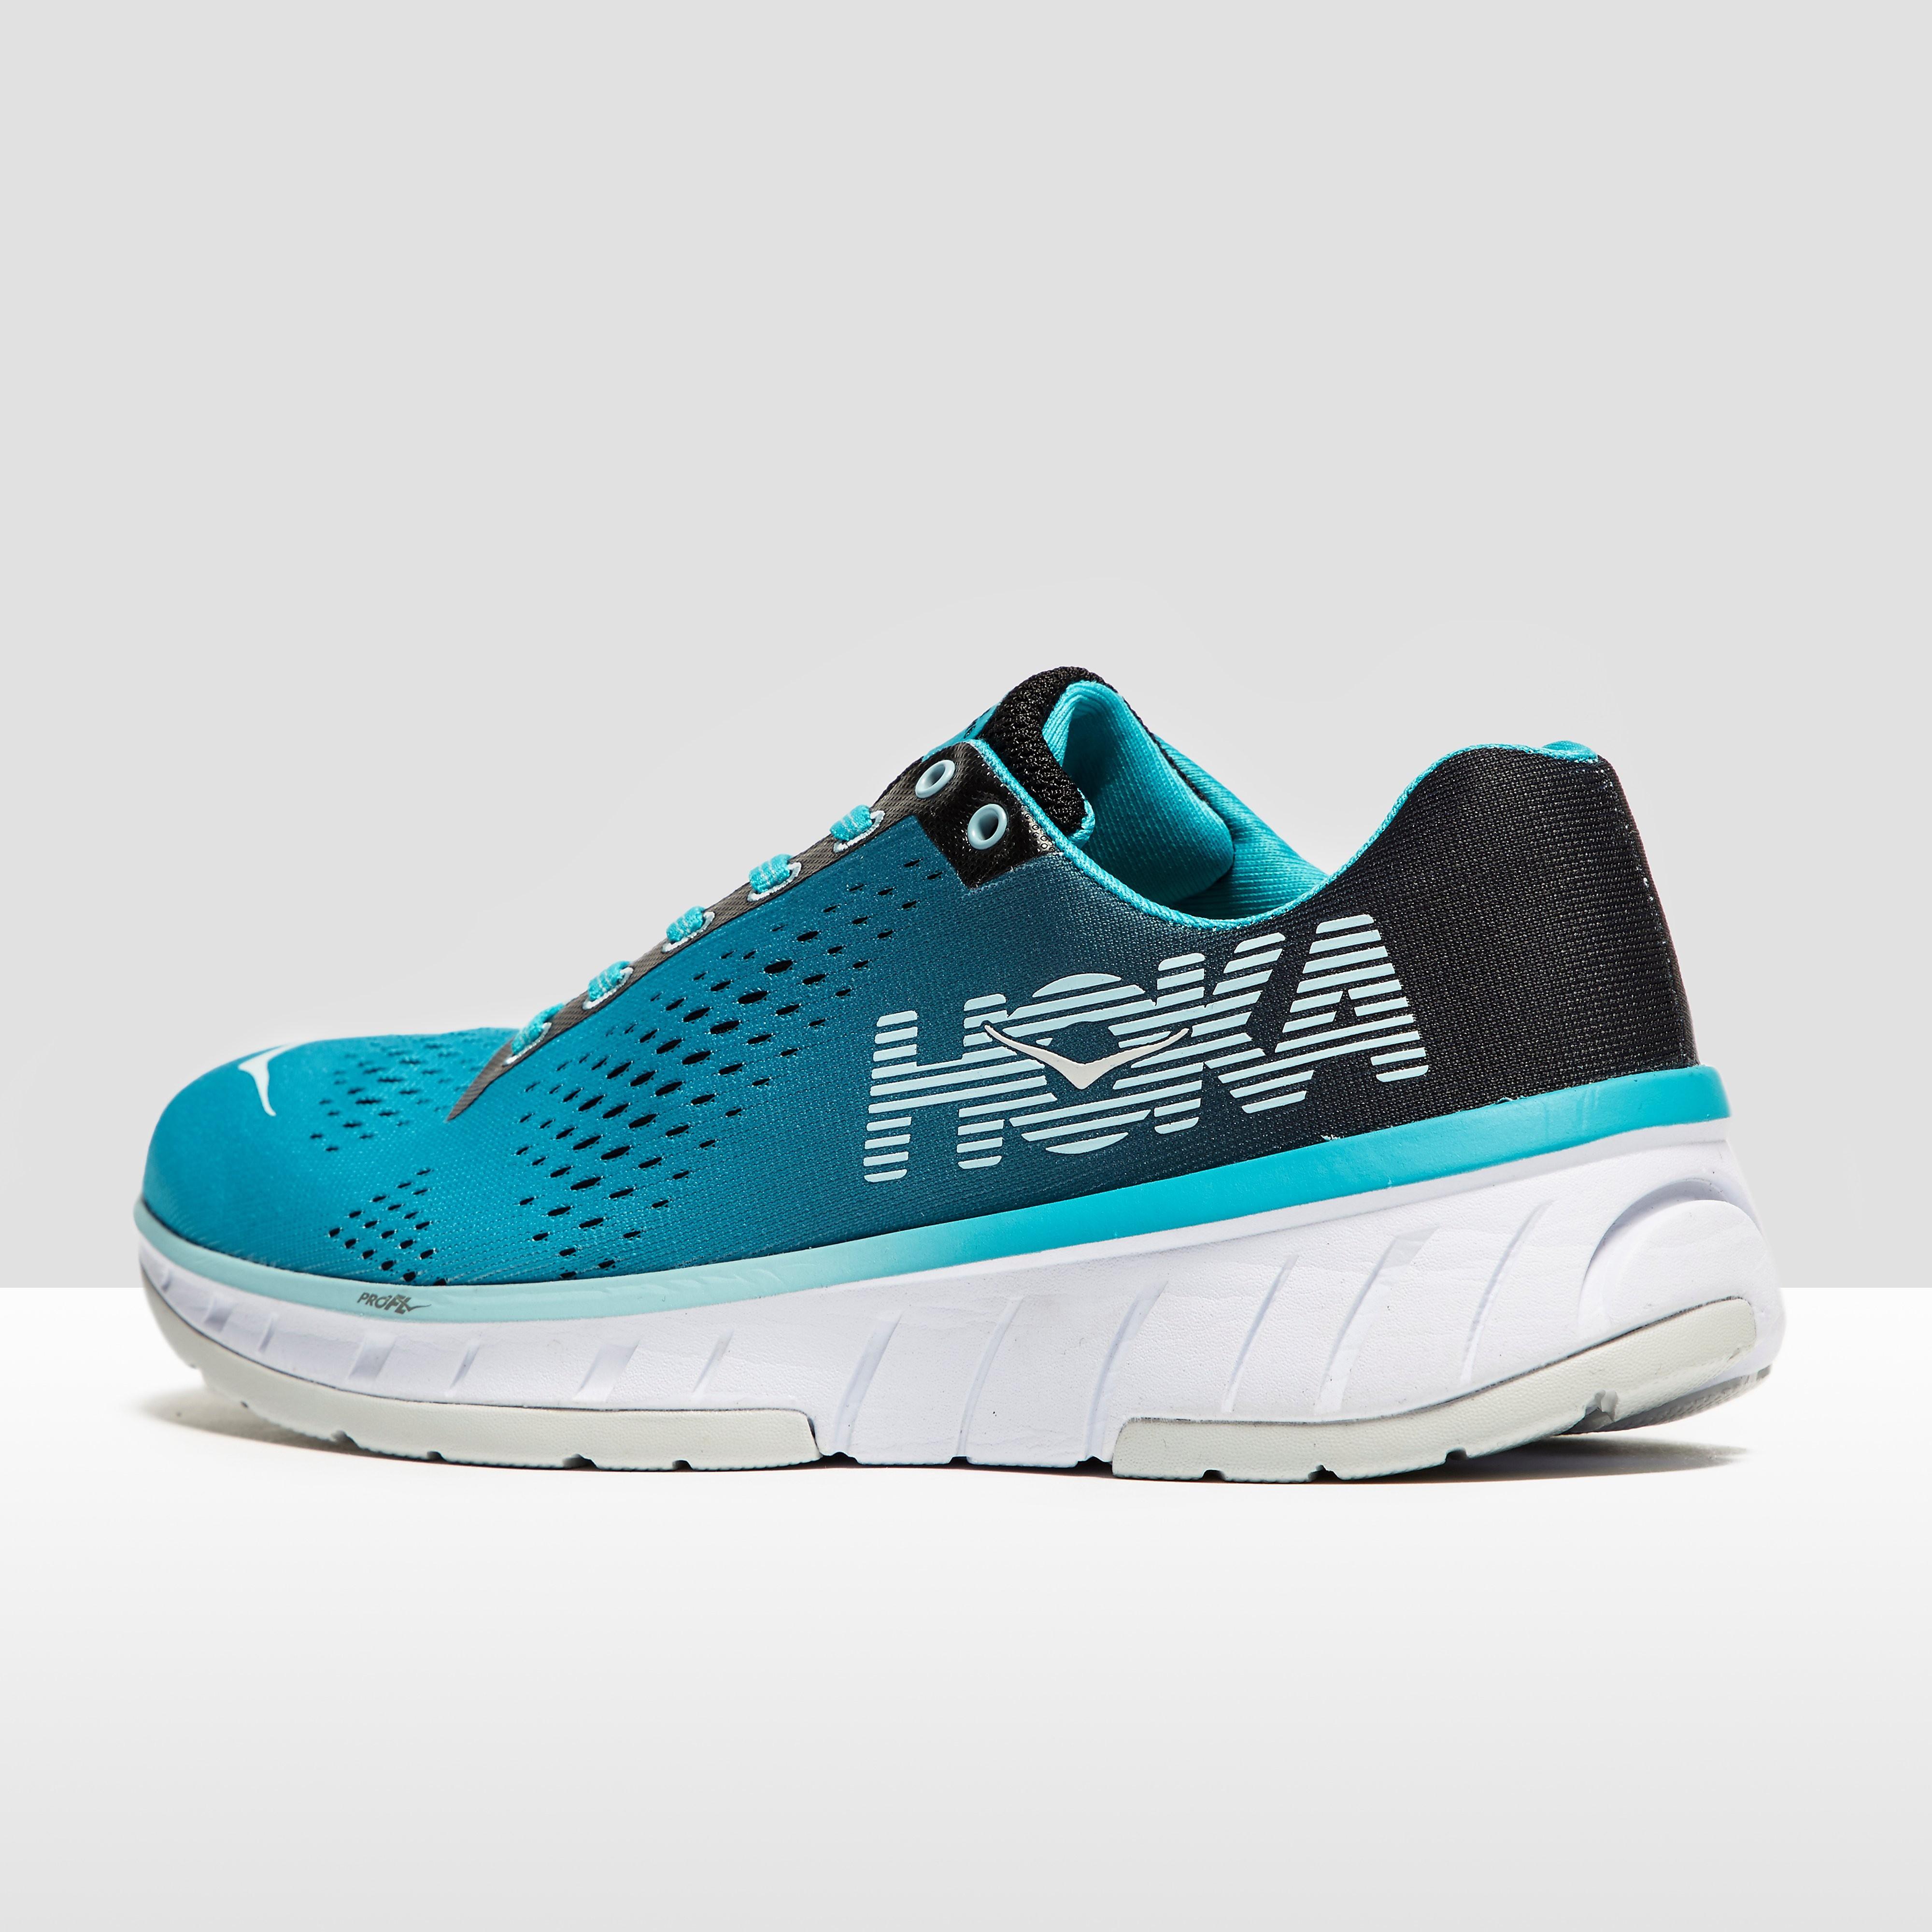 Hoka One One Cavu Women's Running Shoes